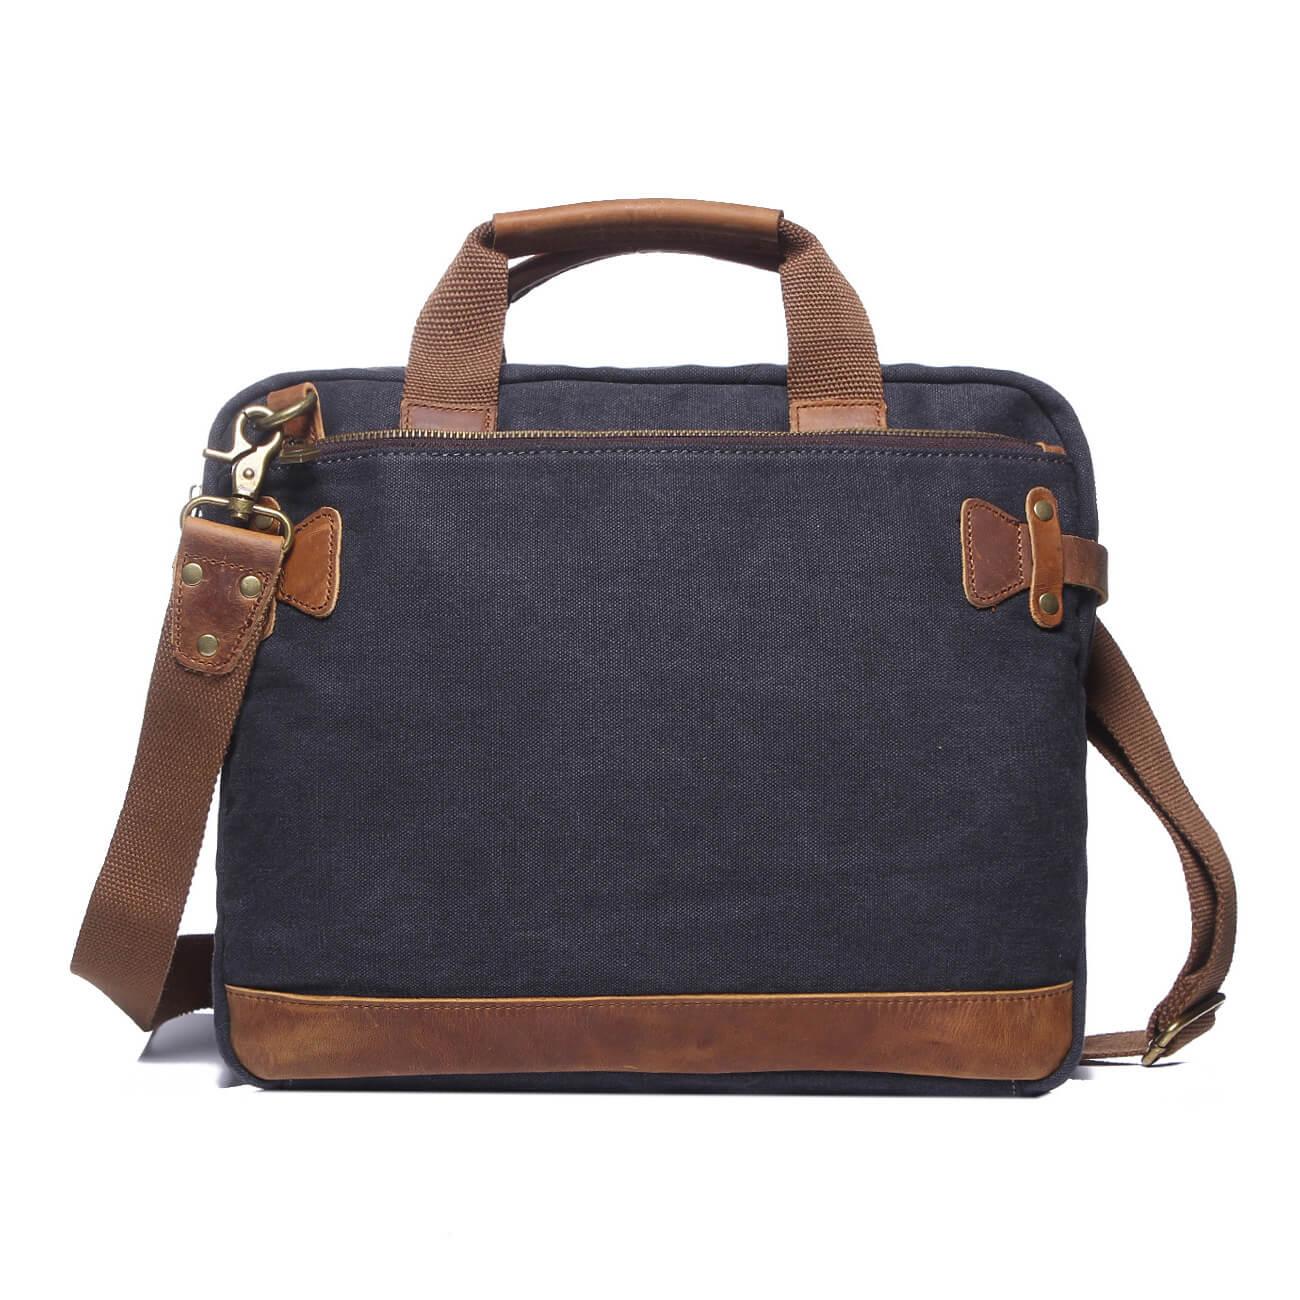 Heavy Cotton Canvas Laptop Bag Tote Business Bag Men Shoulder Bag Briefcase Working Bag